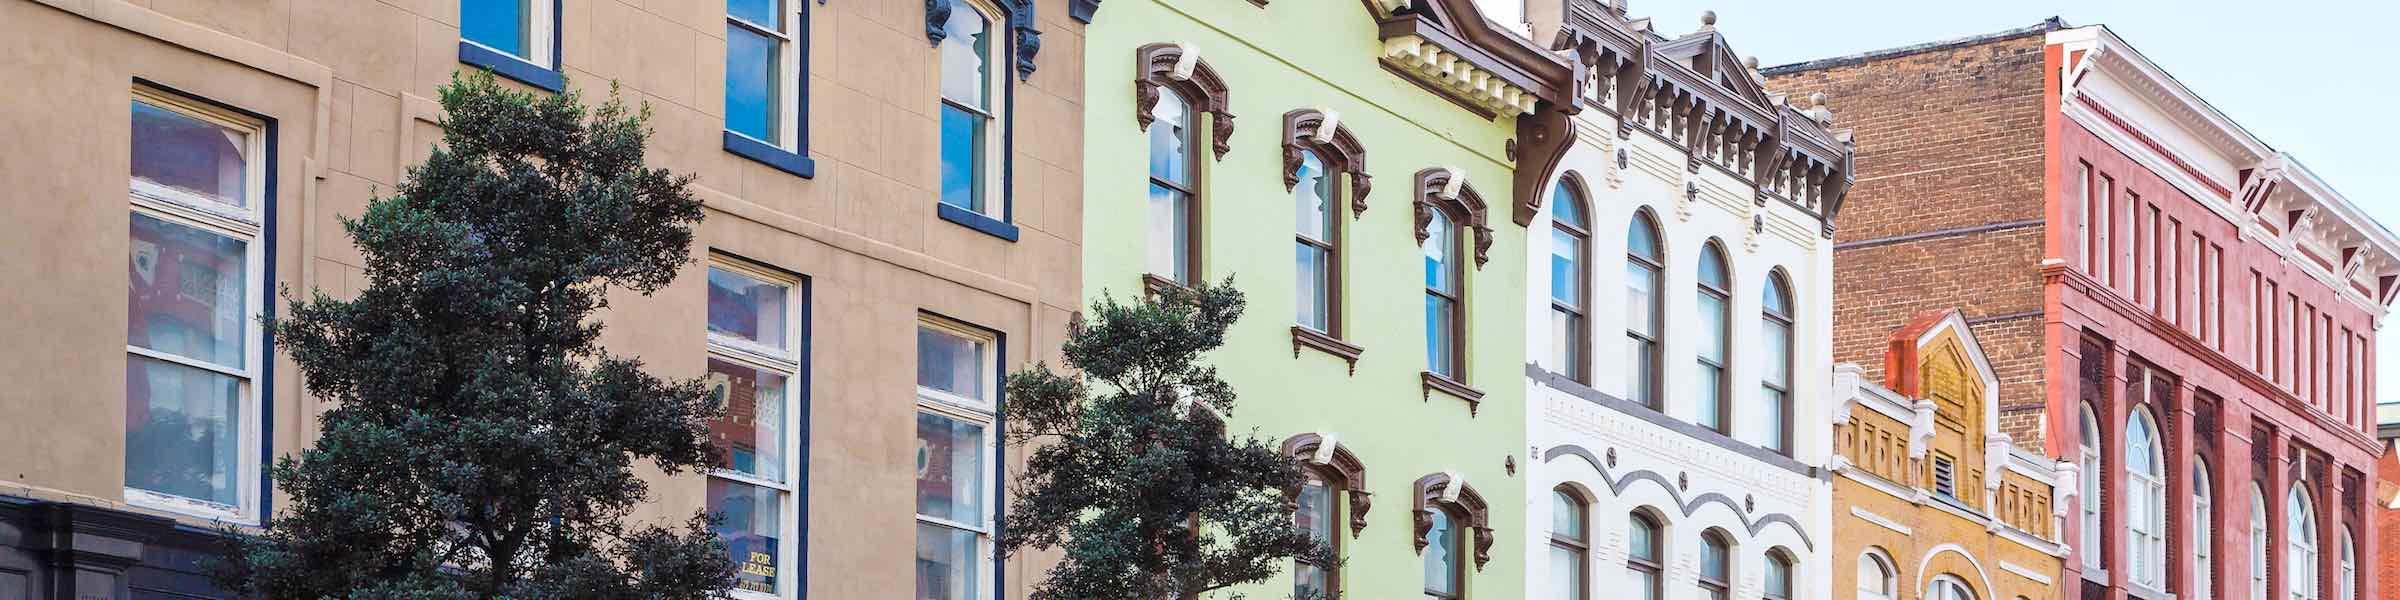 Colorful historic buildings along Broughton Street, Savannah, GA.